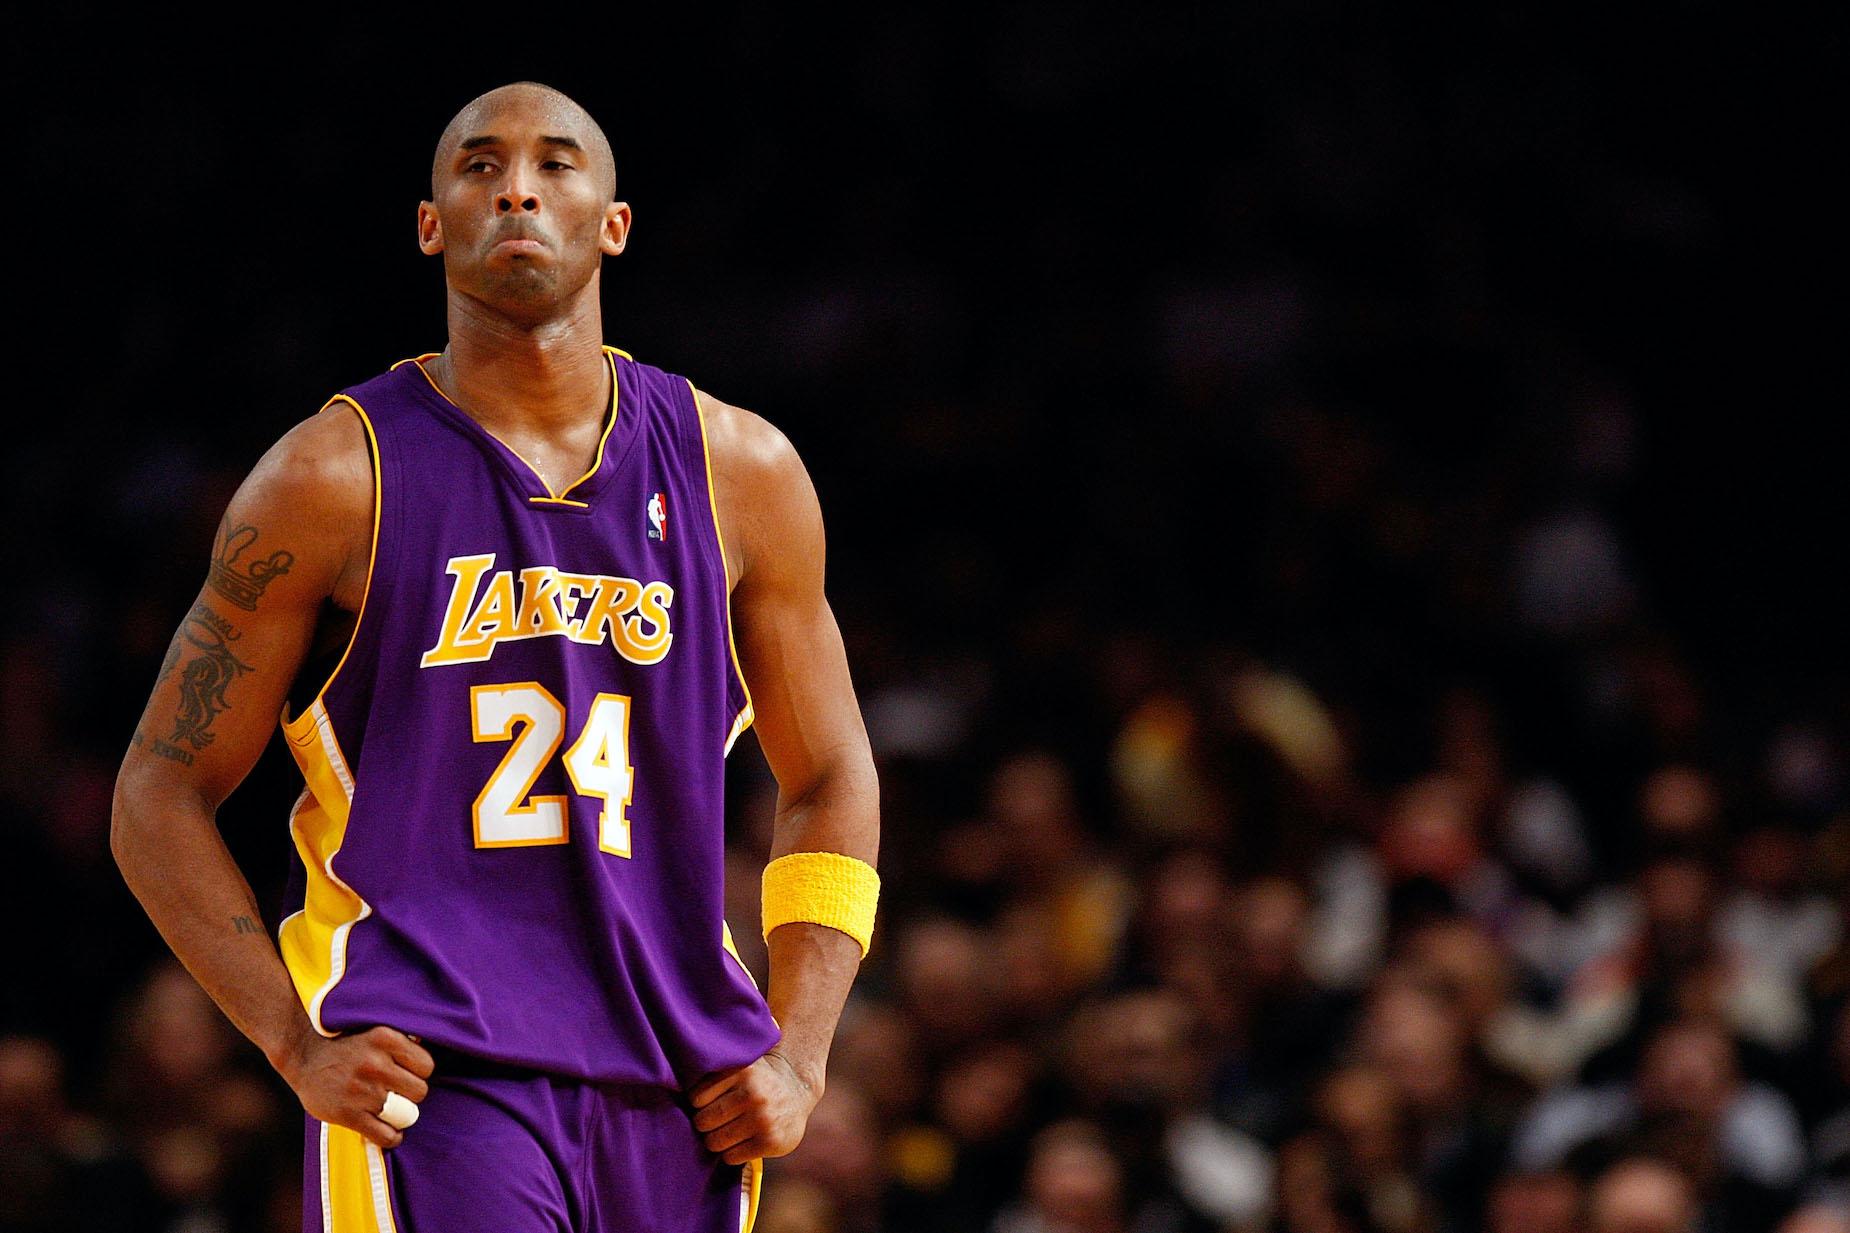 LA Lakers star Kobe Bryant walks down the court